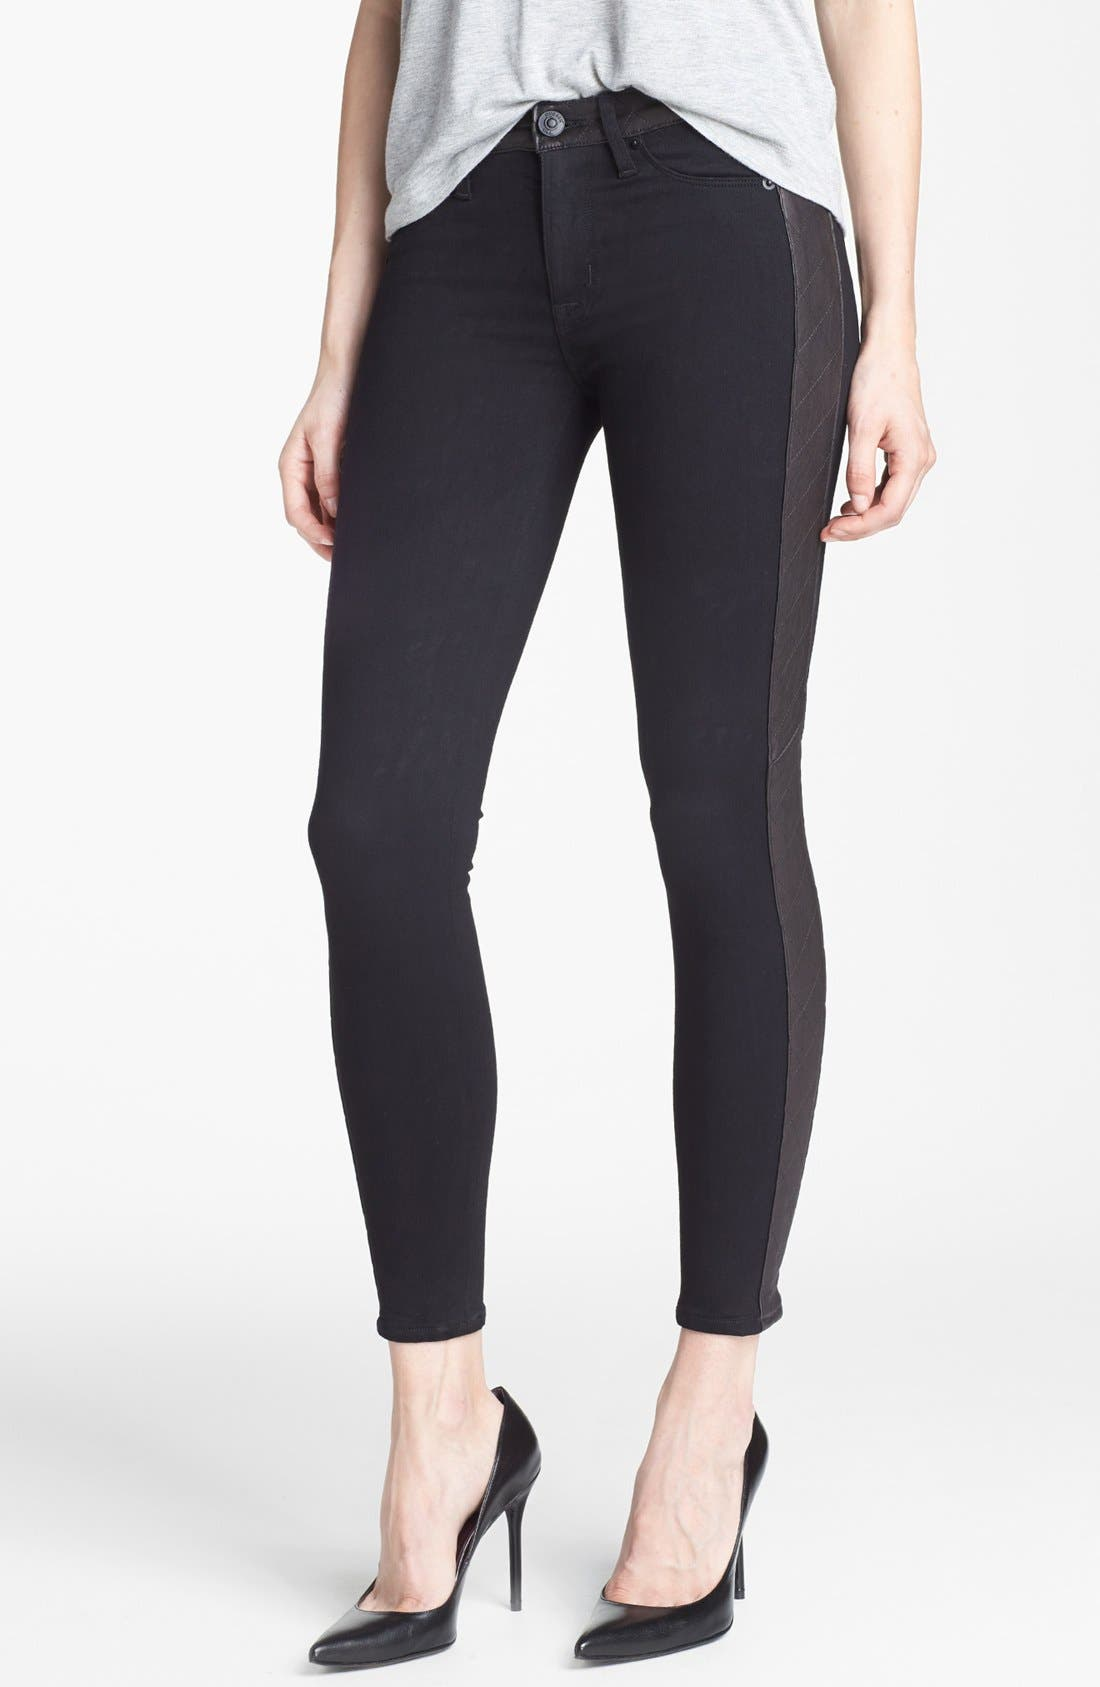 Main Image - Hudson Jeans 'Leeloo' Leather Trim Skinny Ankle Jeans (Black)